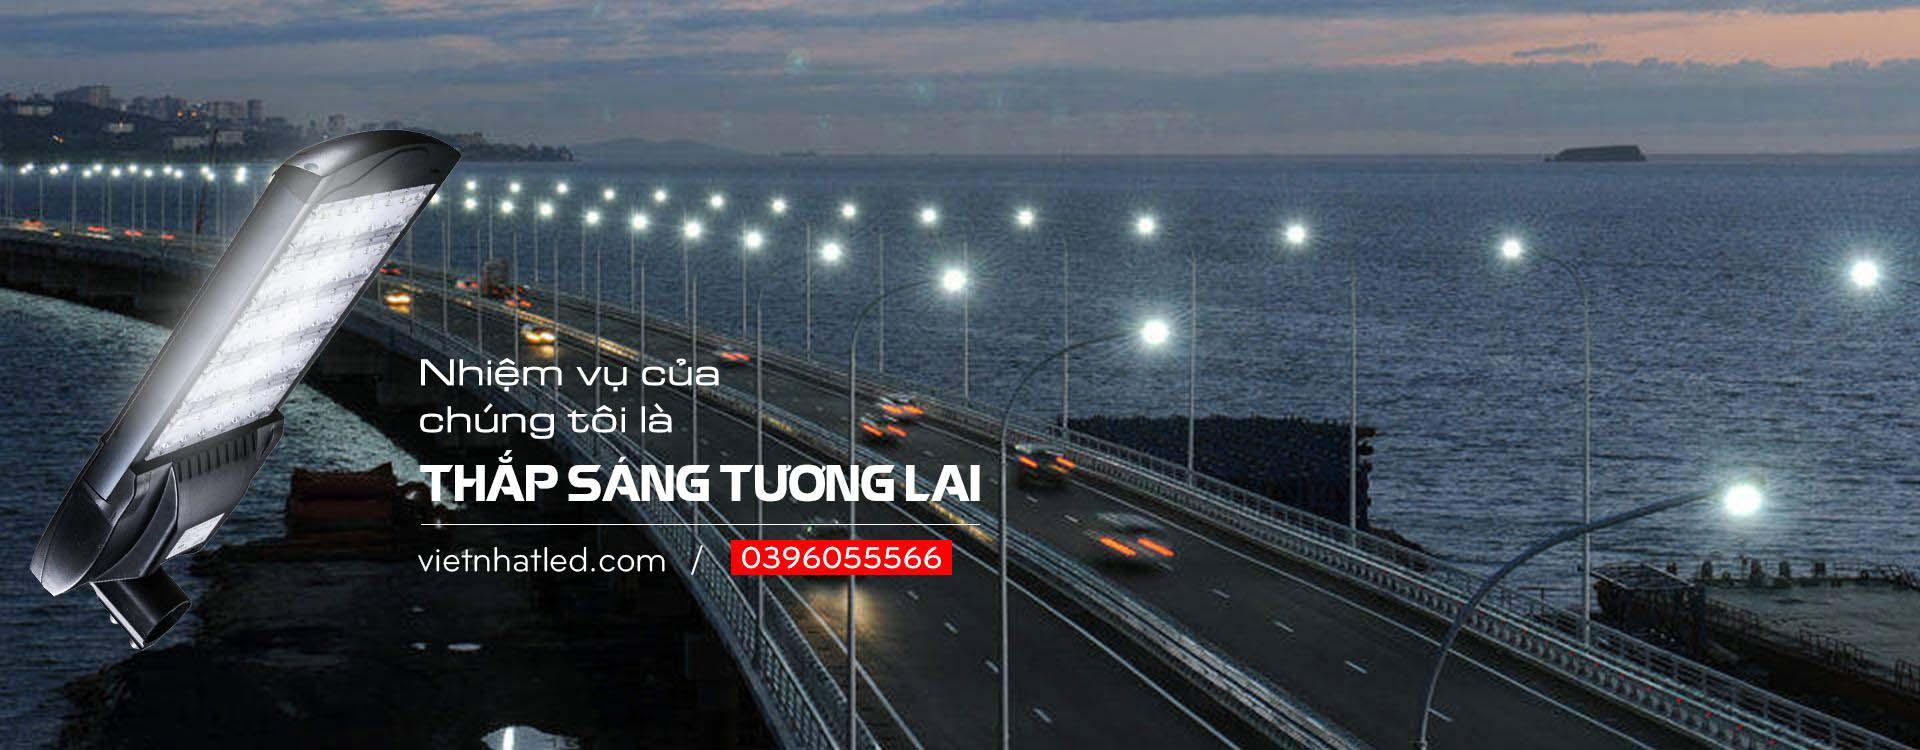 Đèn Led Việt Nhật - Banner 2